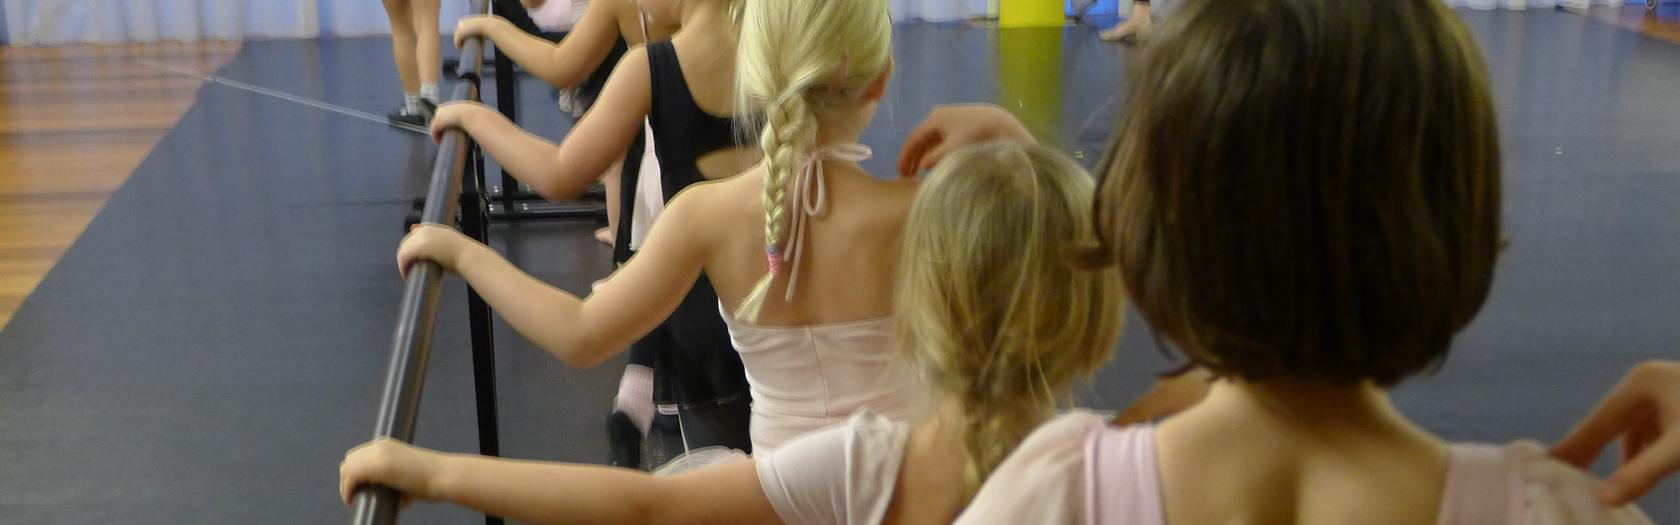 klassiek-ballet-amsterdam-1680x525_c